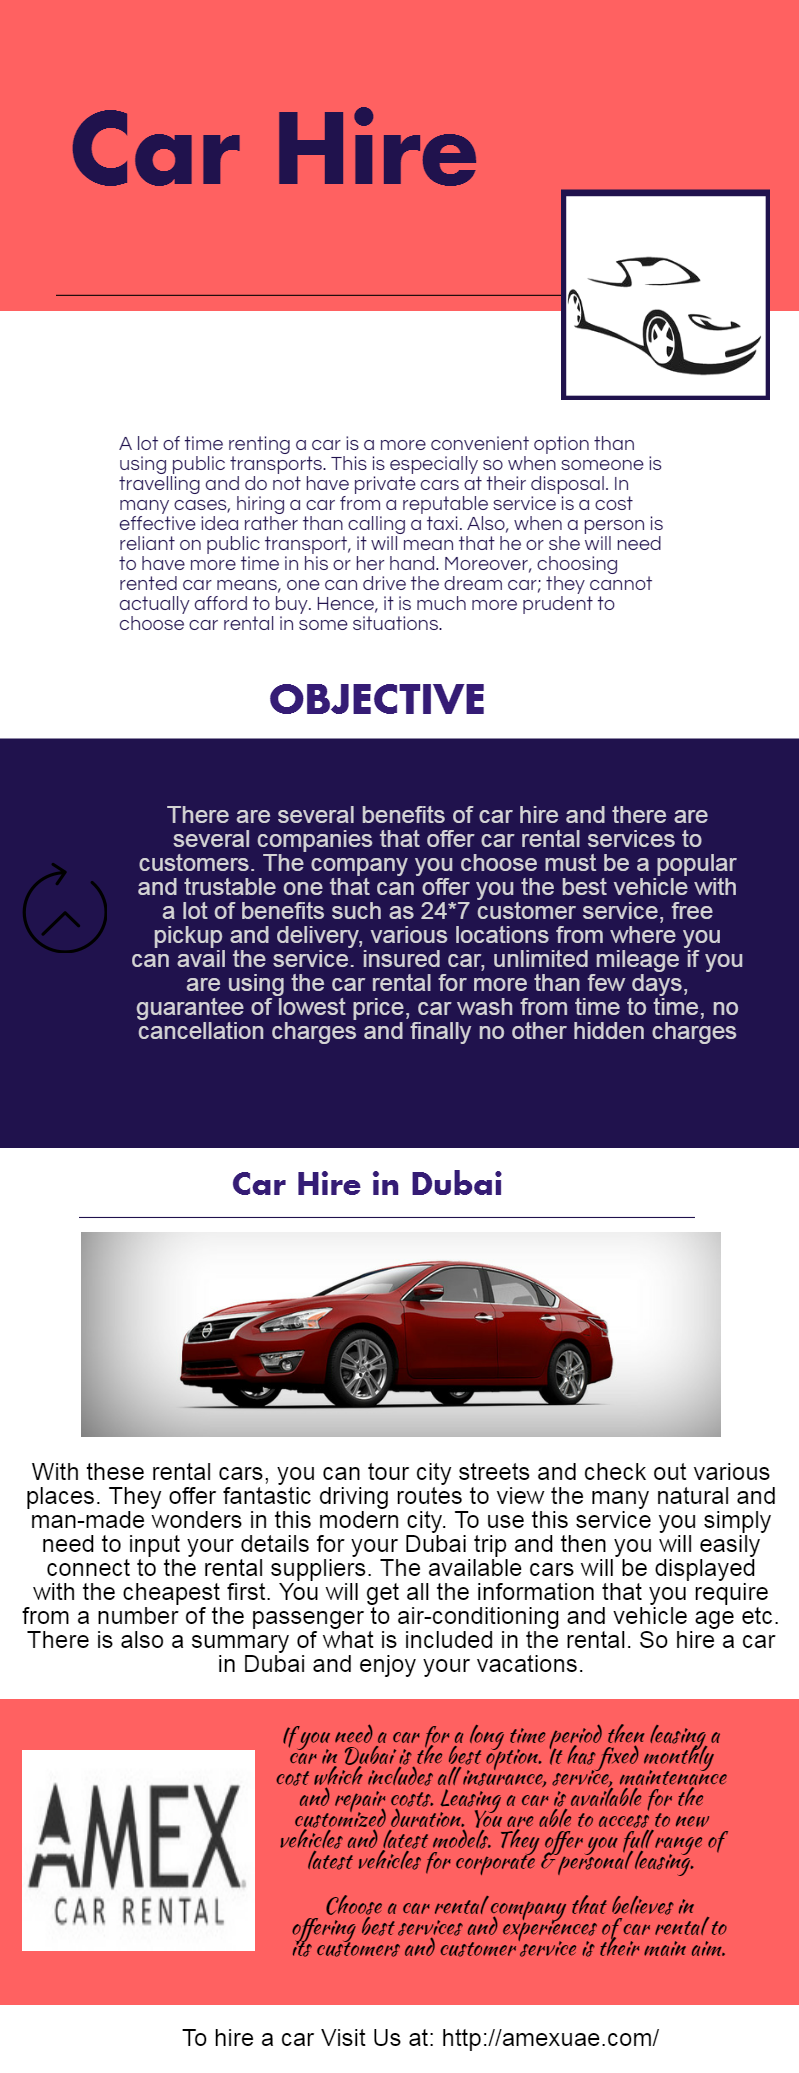 Amex rent a car strives to provide car rental, car lease